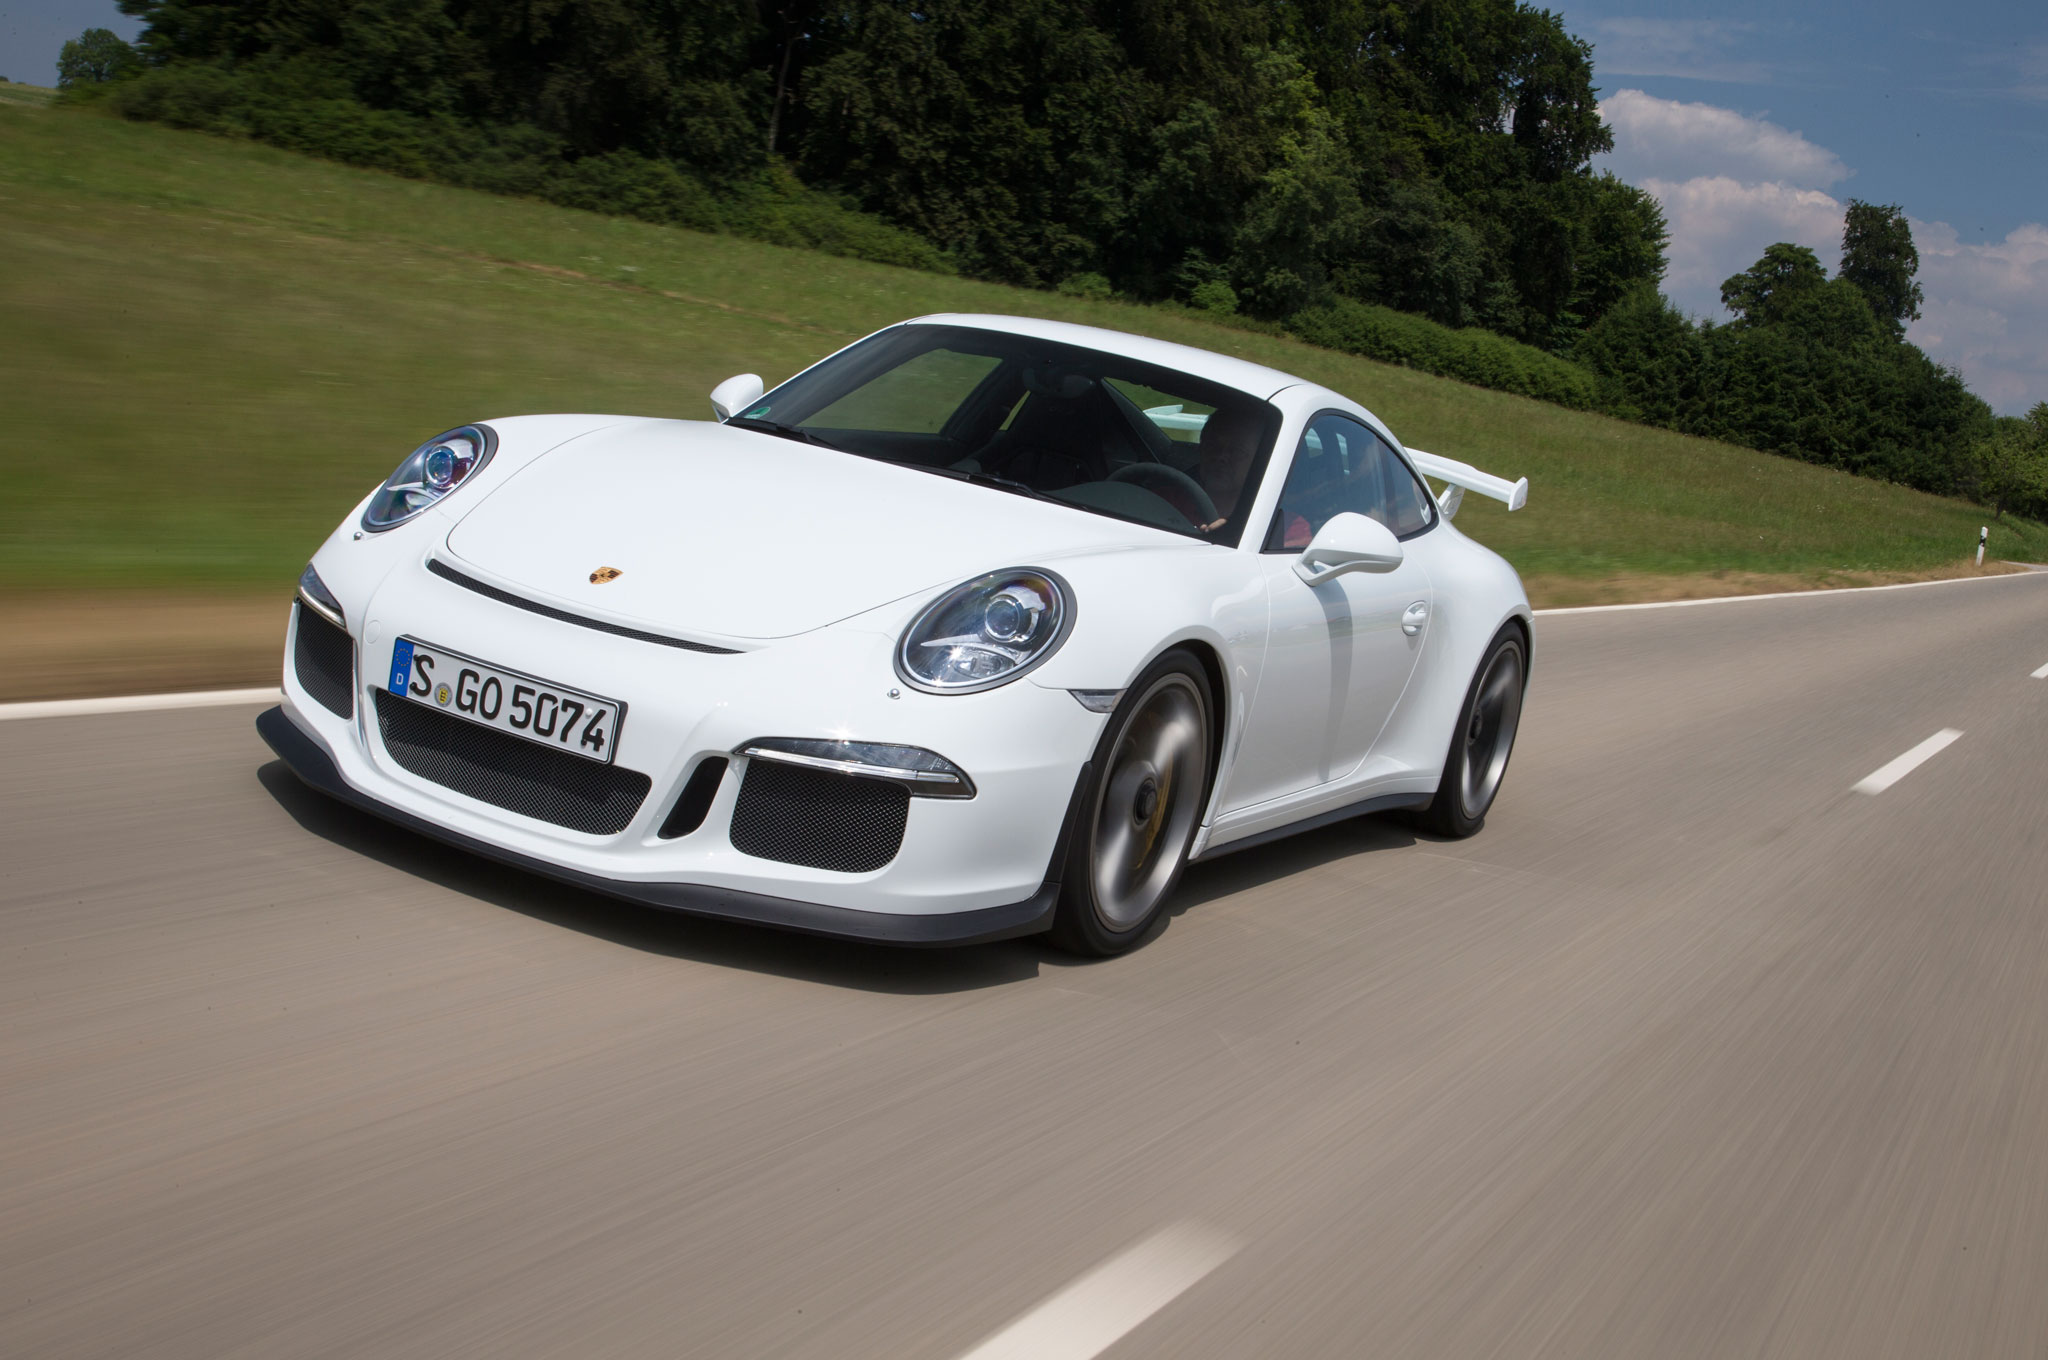 2014 porsche 911 gt3 second drive automobile magazine rh automobilemag com 2013 911 RSR 2013 911 Turbo